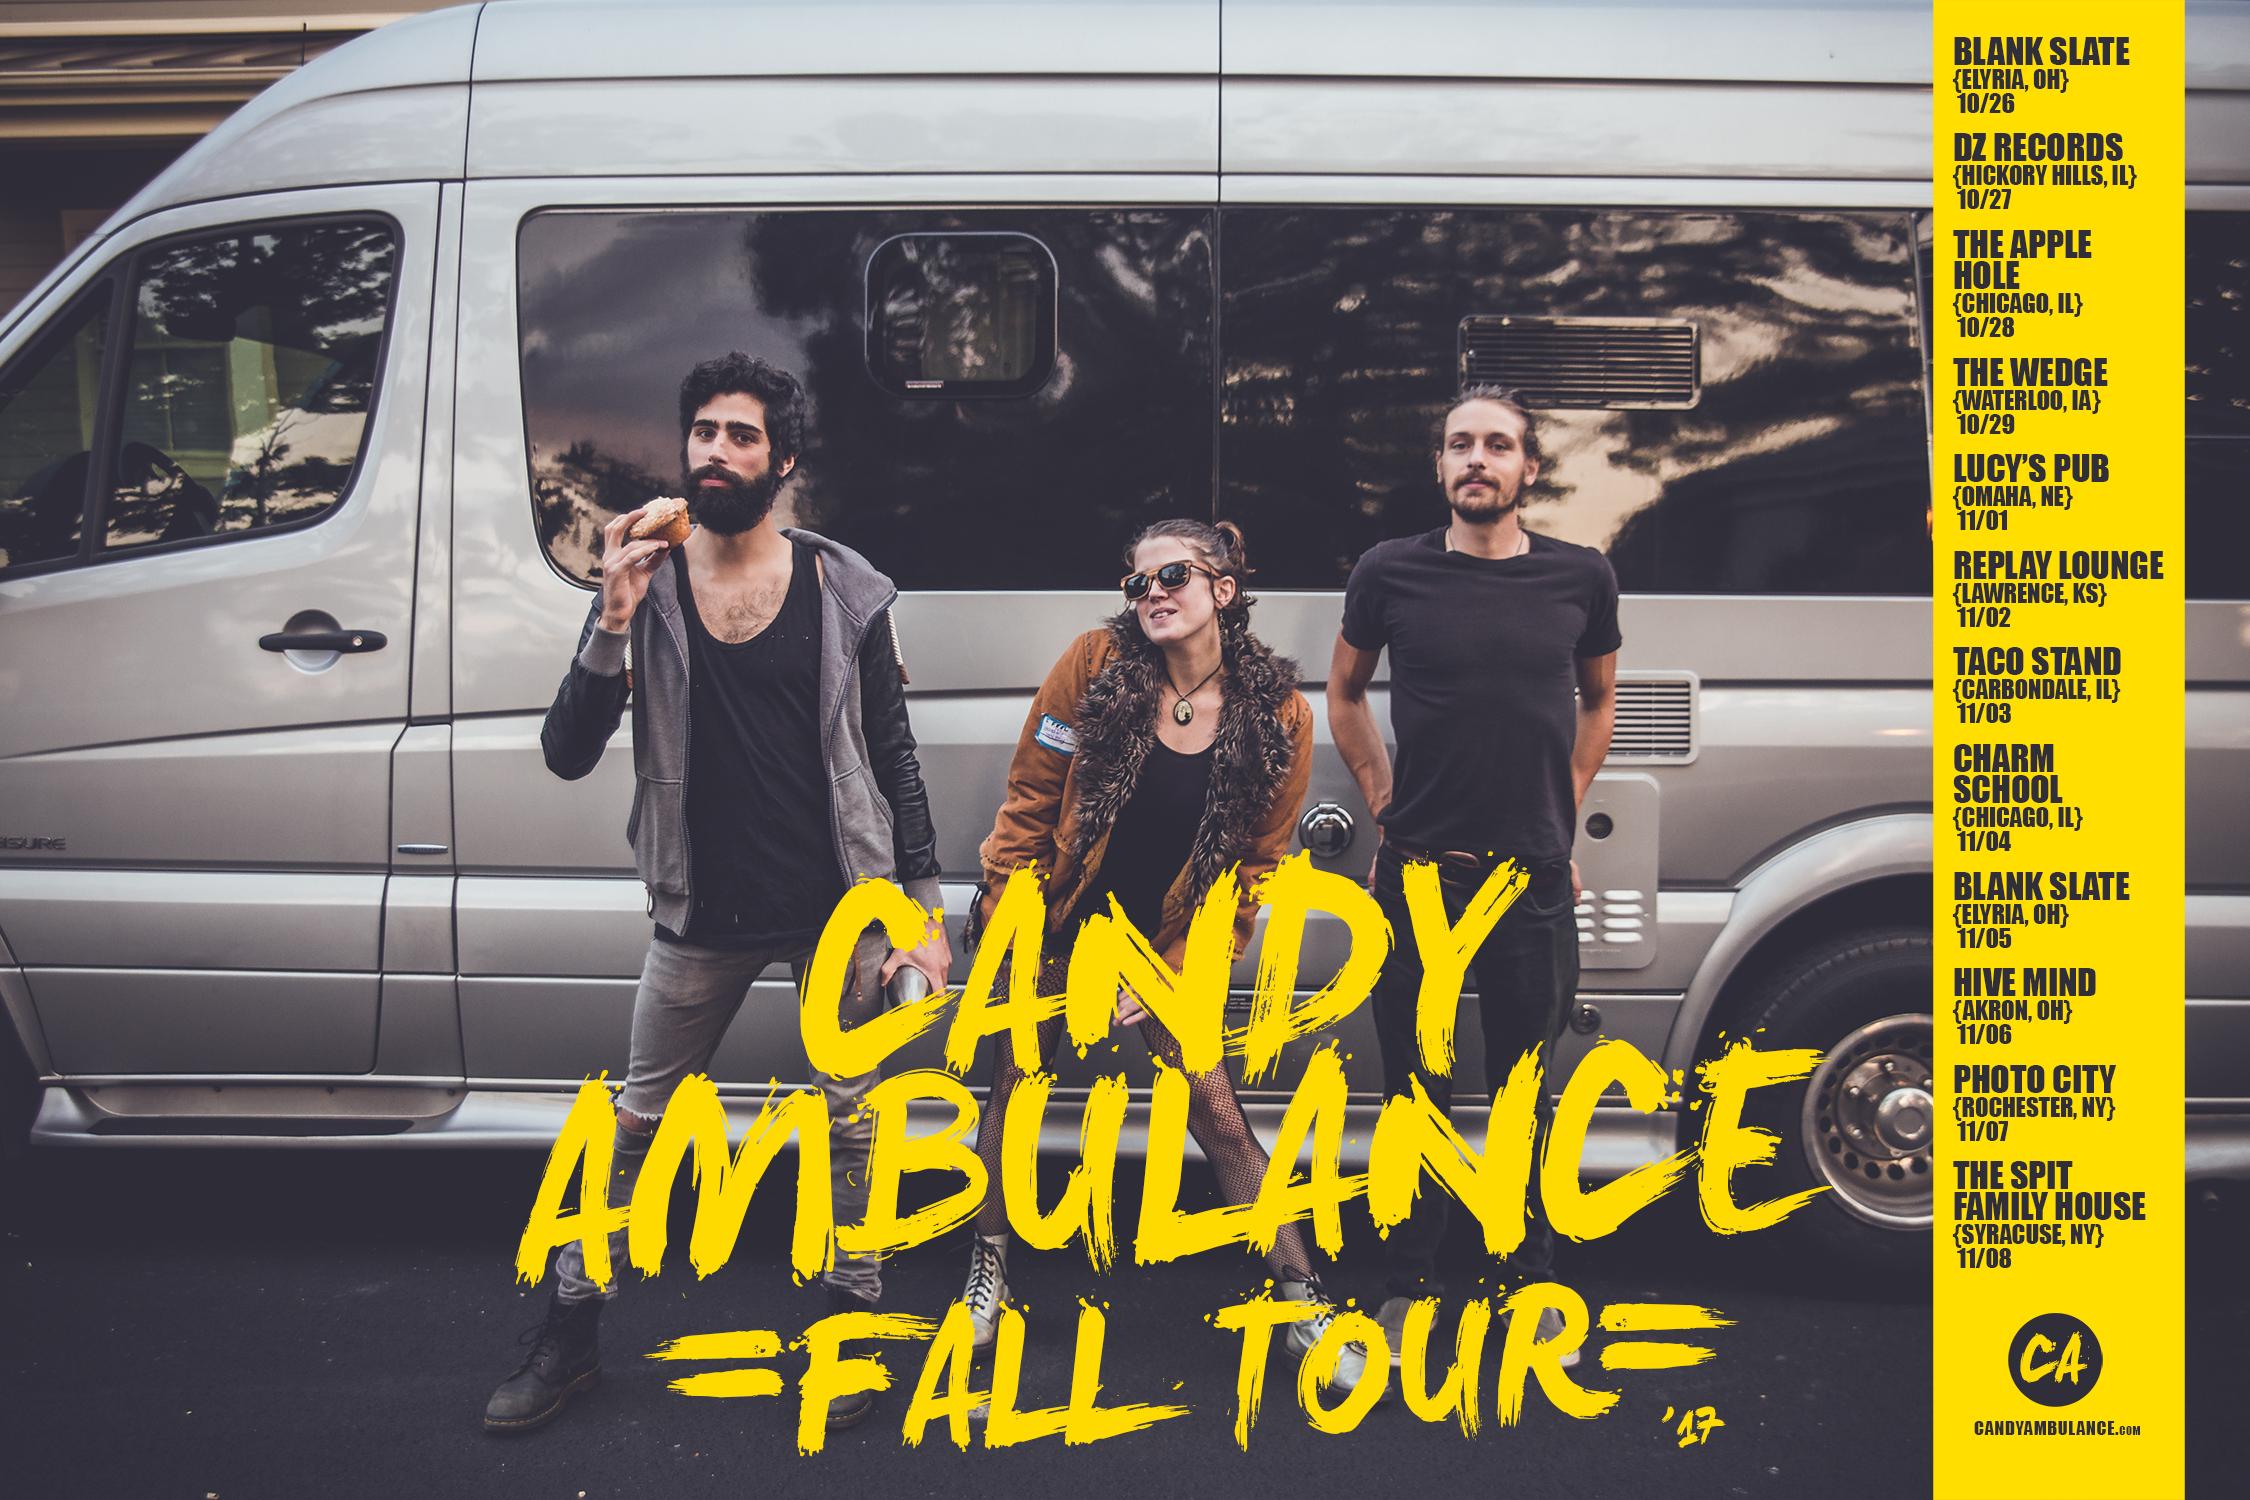 FALL TOUR 2017